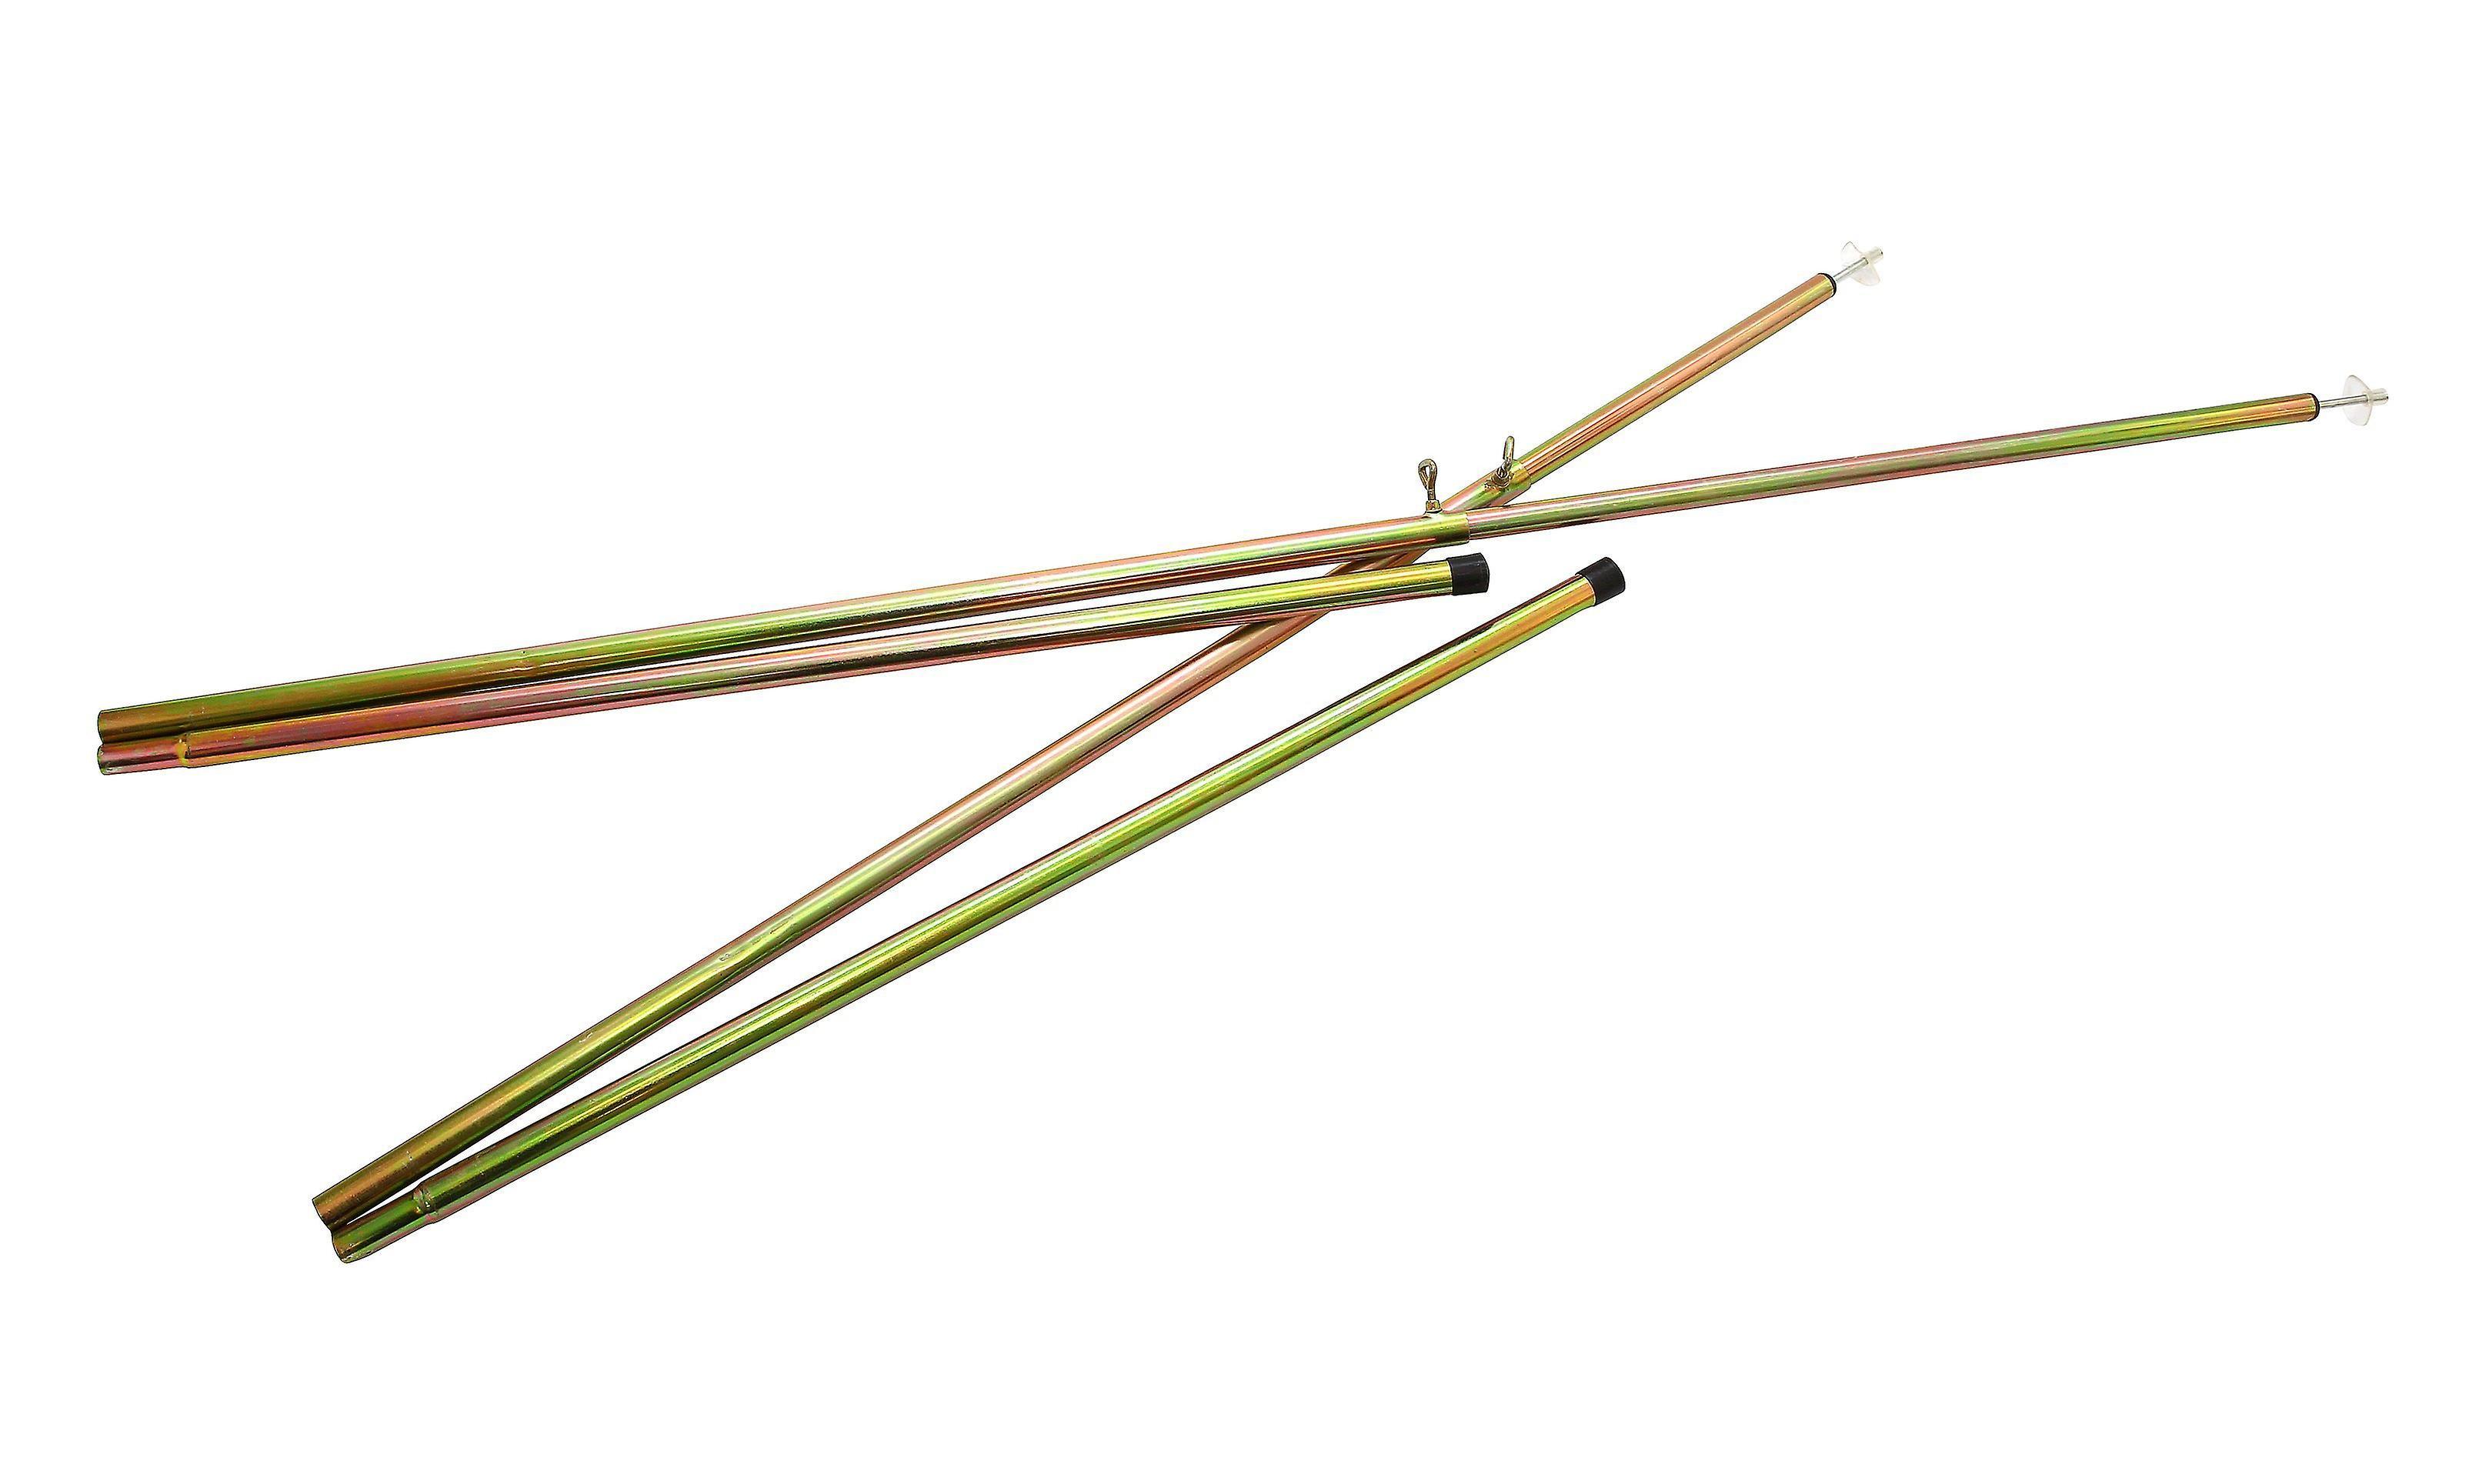 Adjustable Awning Poles